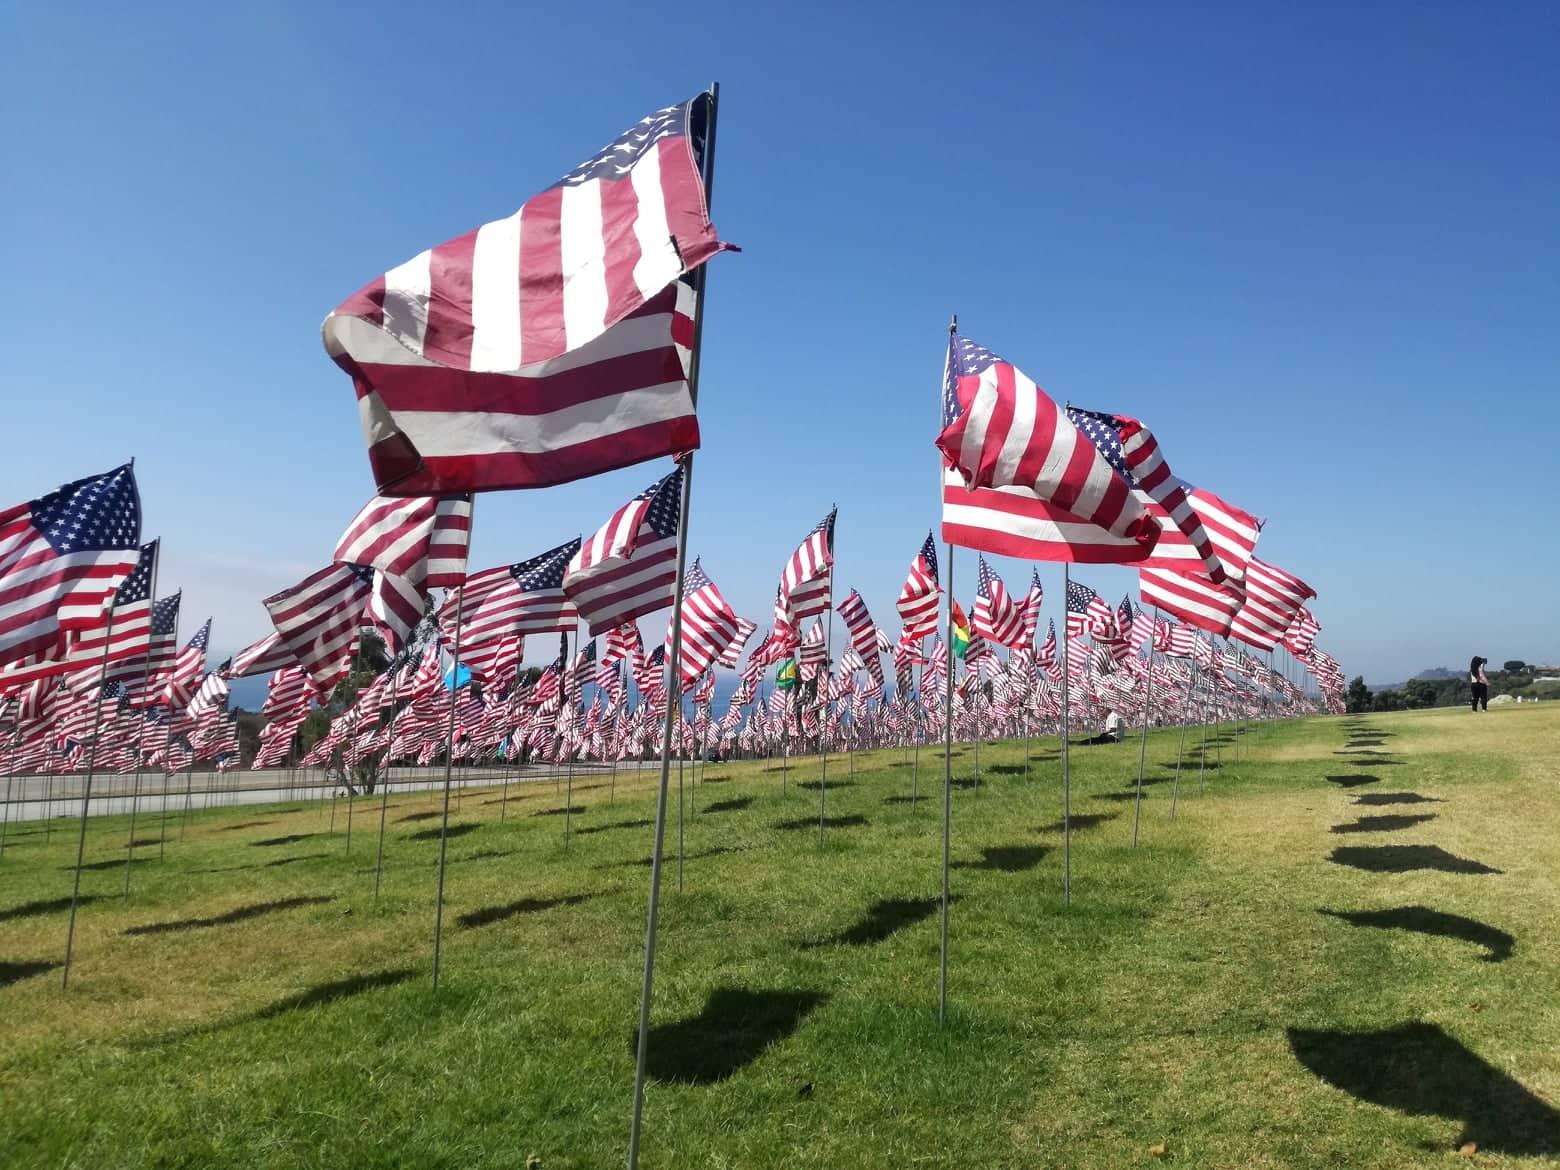 9/11 memorial, Pepperdine University, malibu